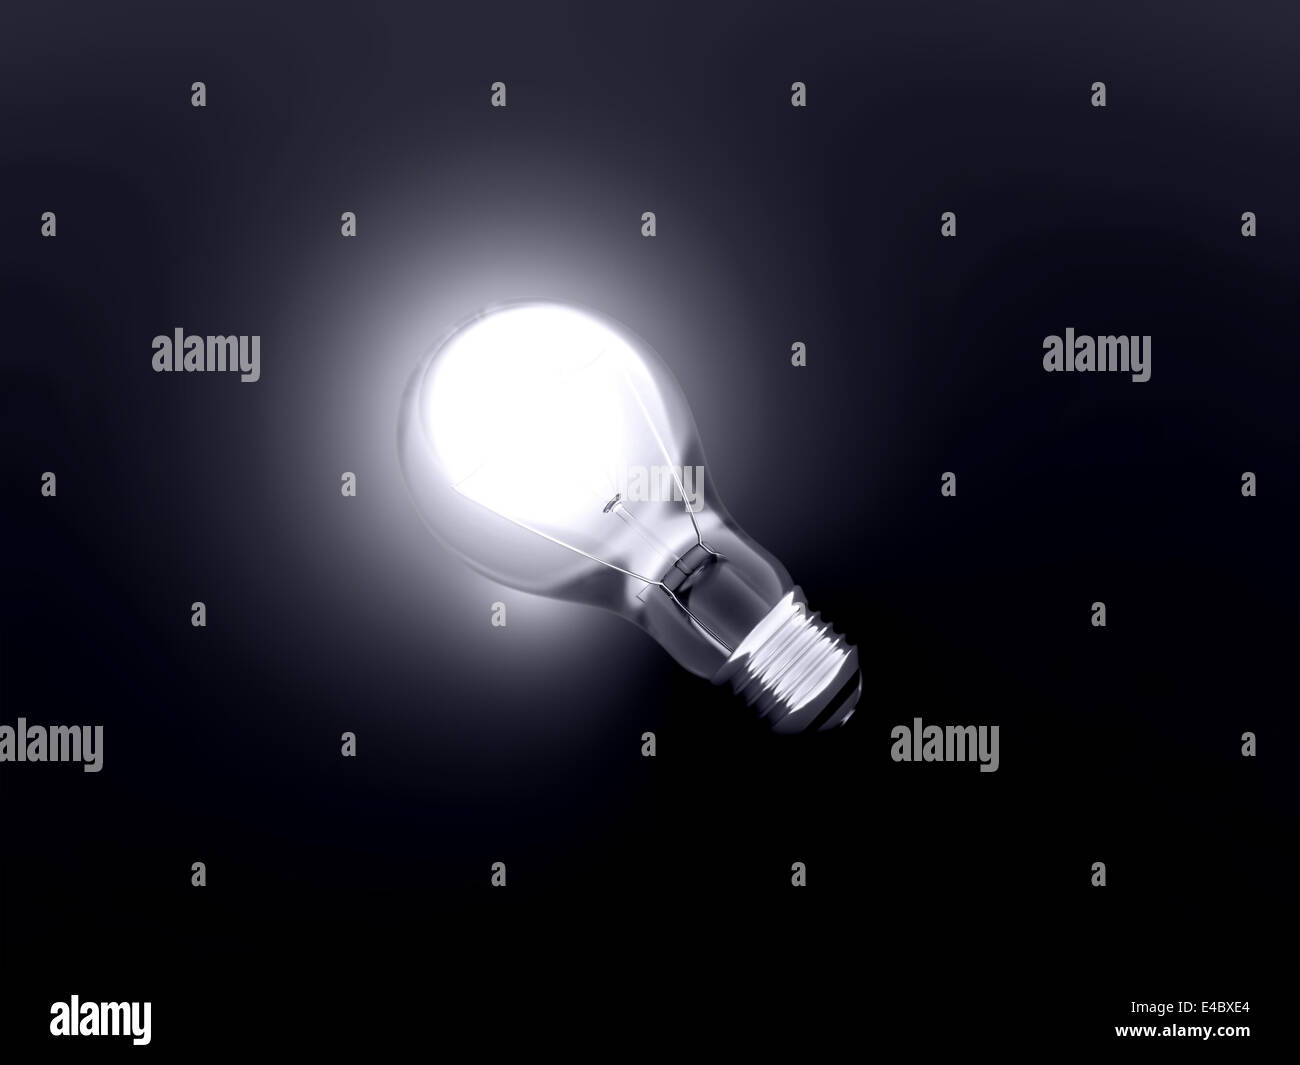 luminous bulb lies on a dark background - Stock Image